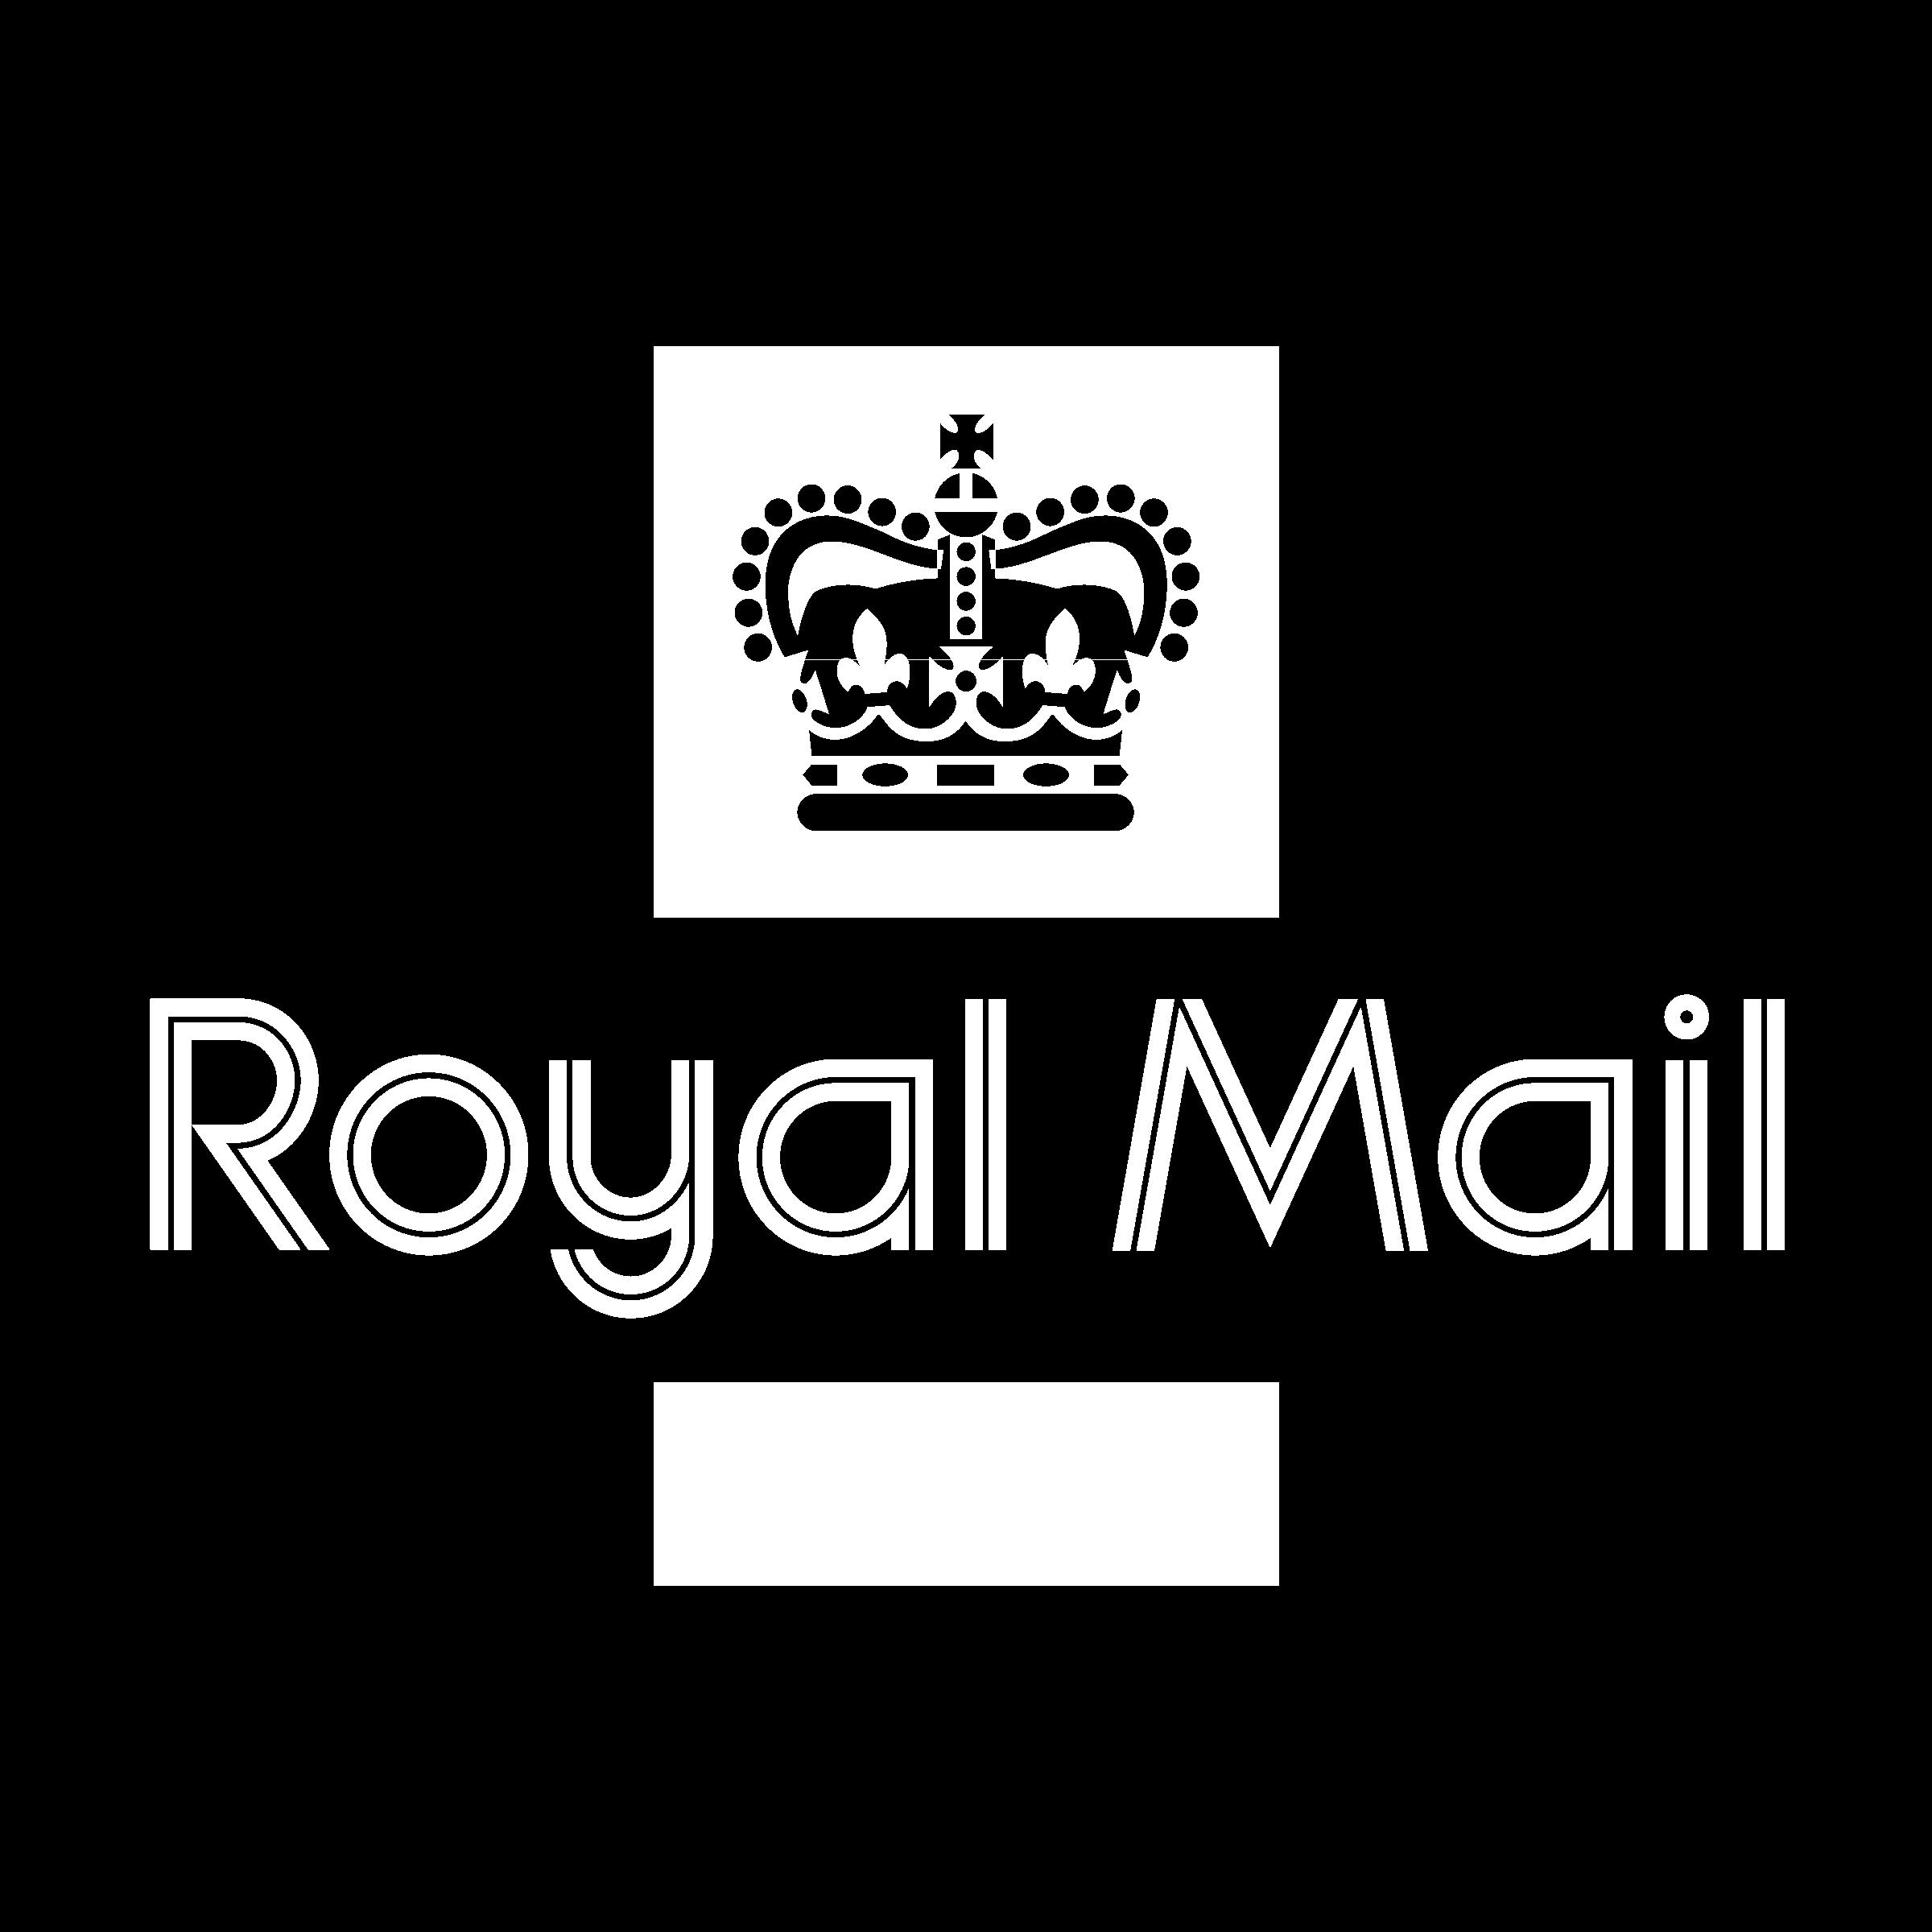 Royal Mail Logo PNG Transparent & SVG Vector - Freebie Supply